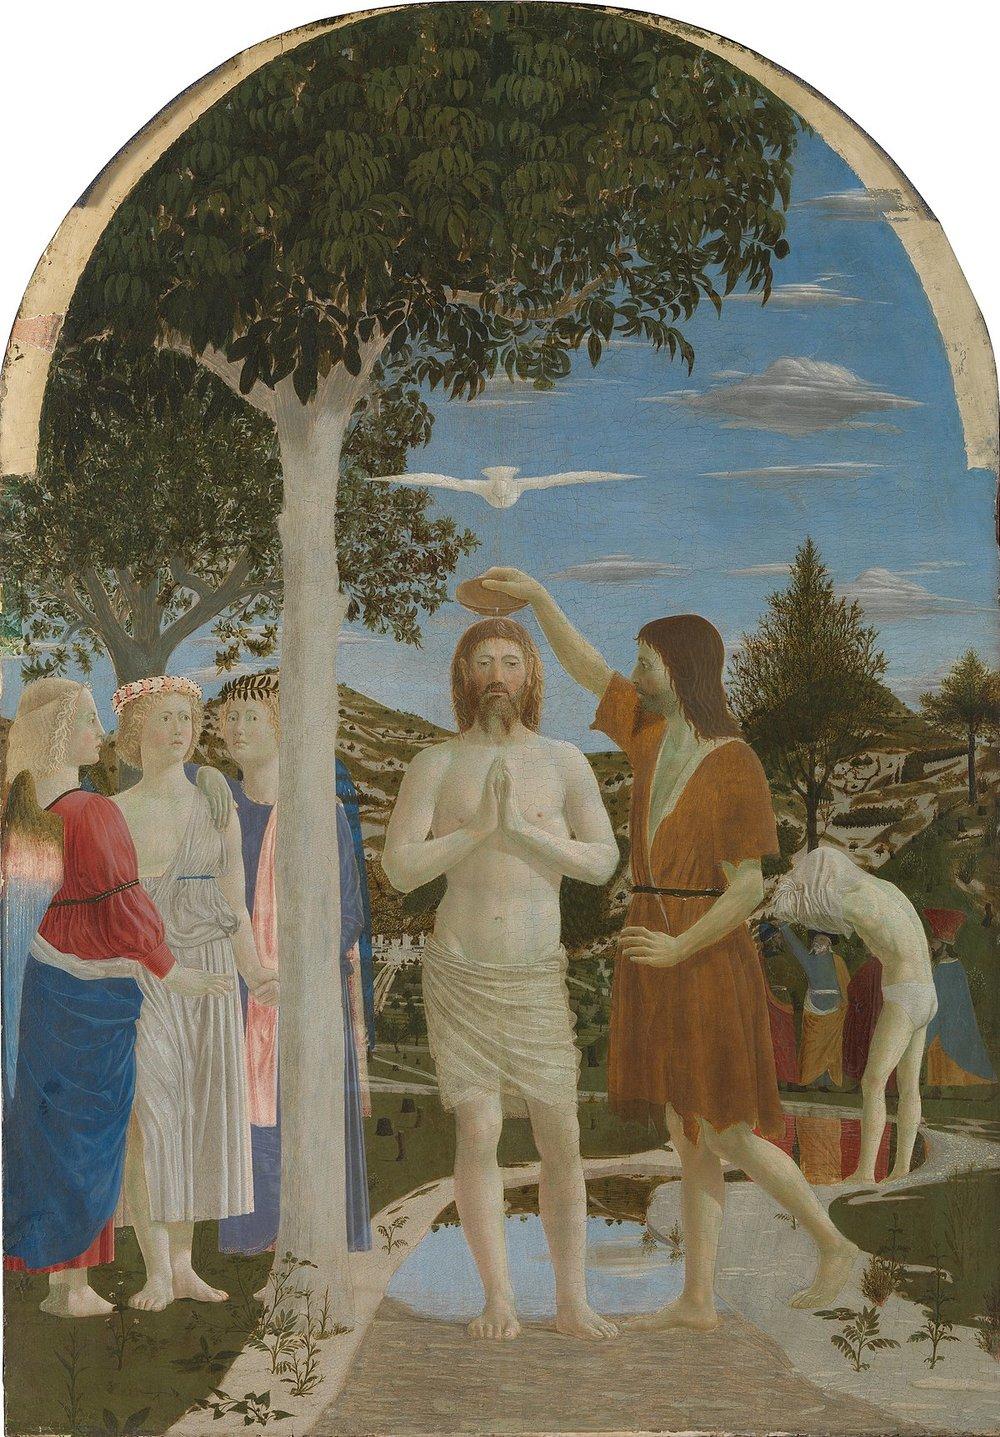 The Baptism of Christ, Piero della Francesca 1450